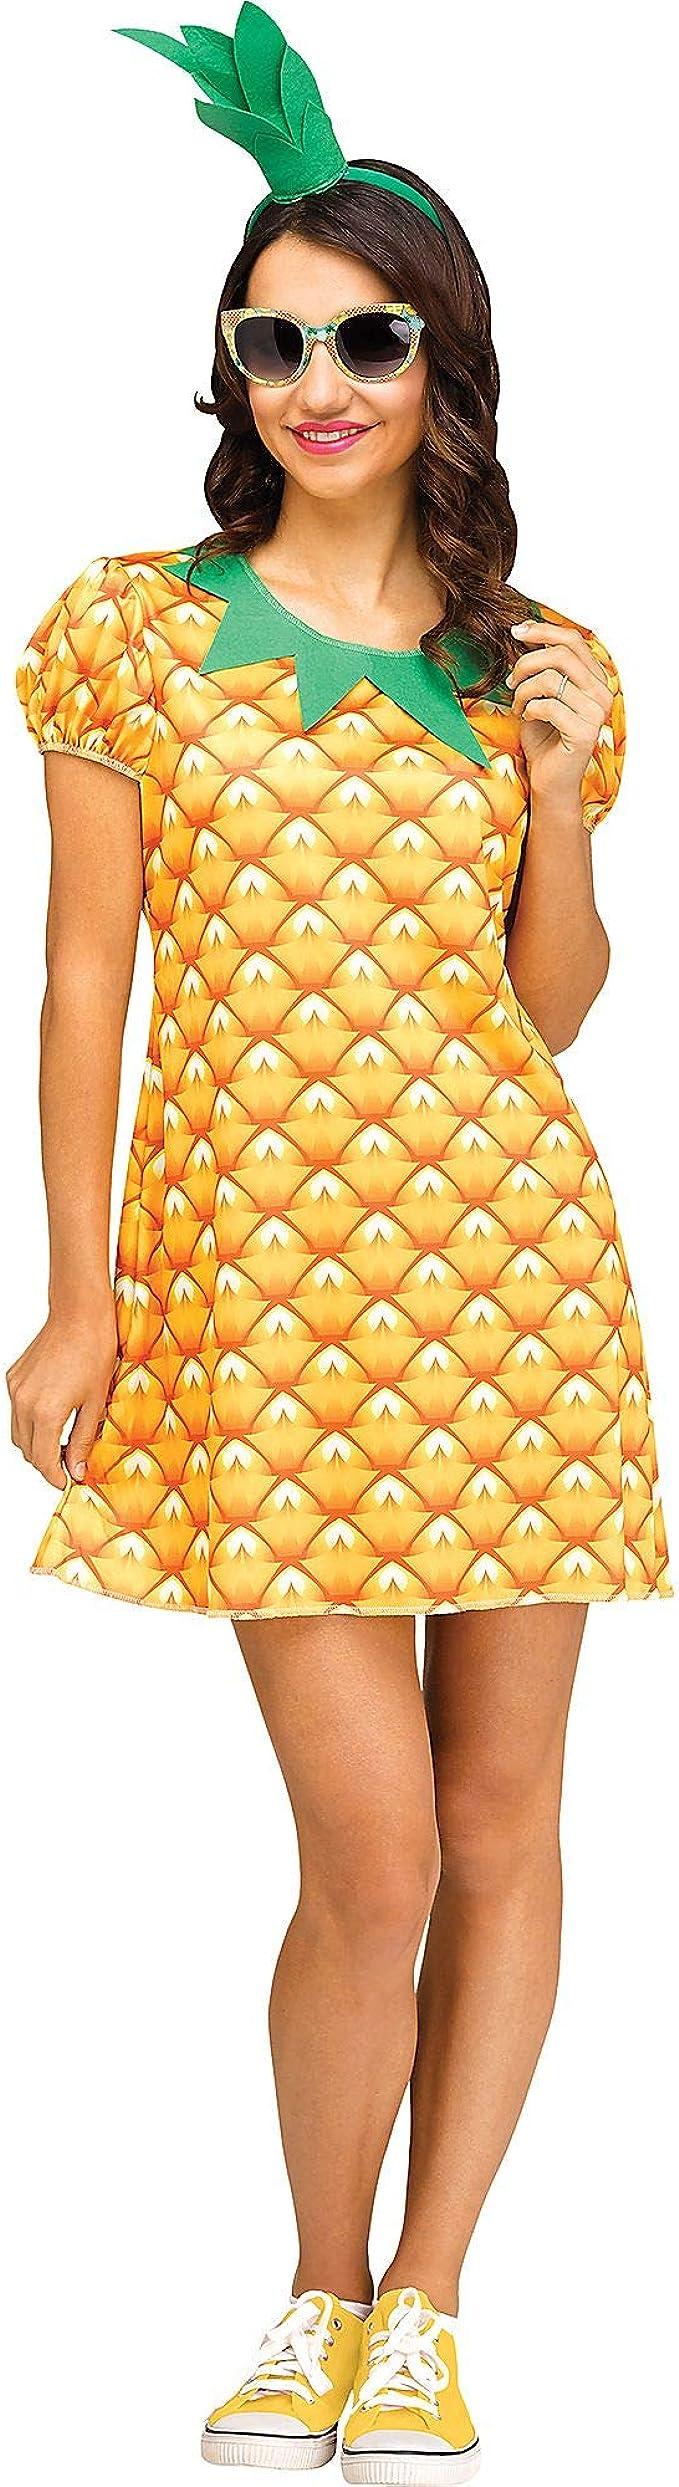 60s Costumes: Hippie, Go Go Dancer, Flower Child, Mod Style Fun World Womens Cute Pineapple Costume  AT vintagedancer.com